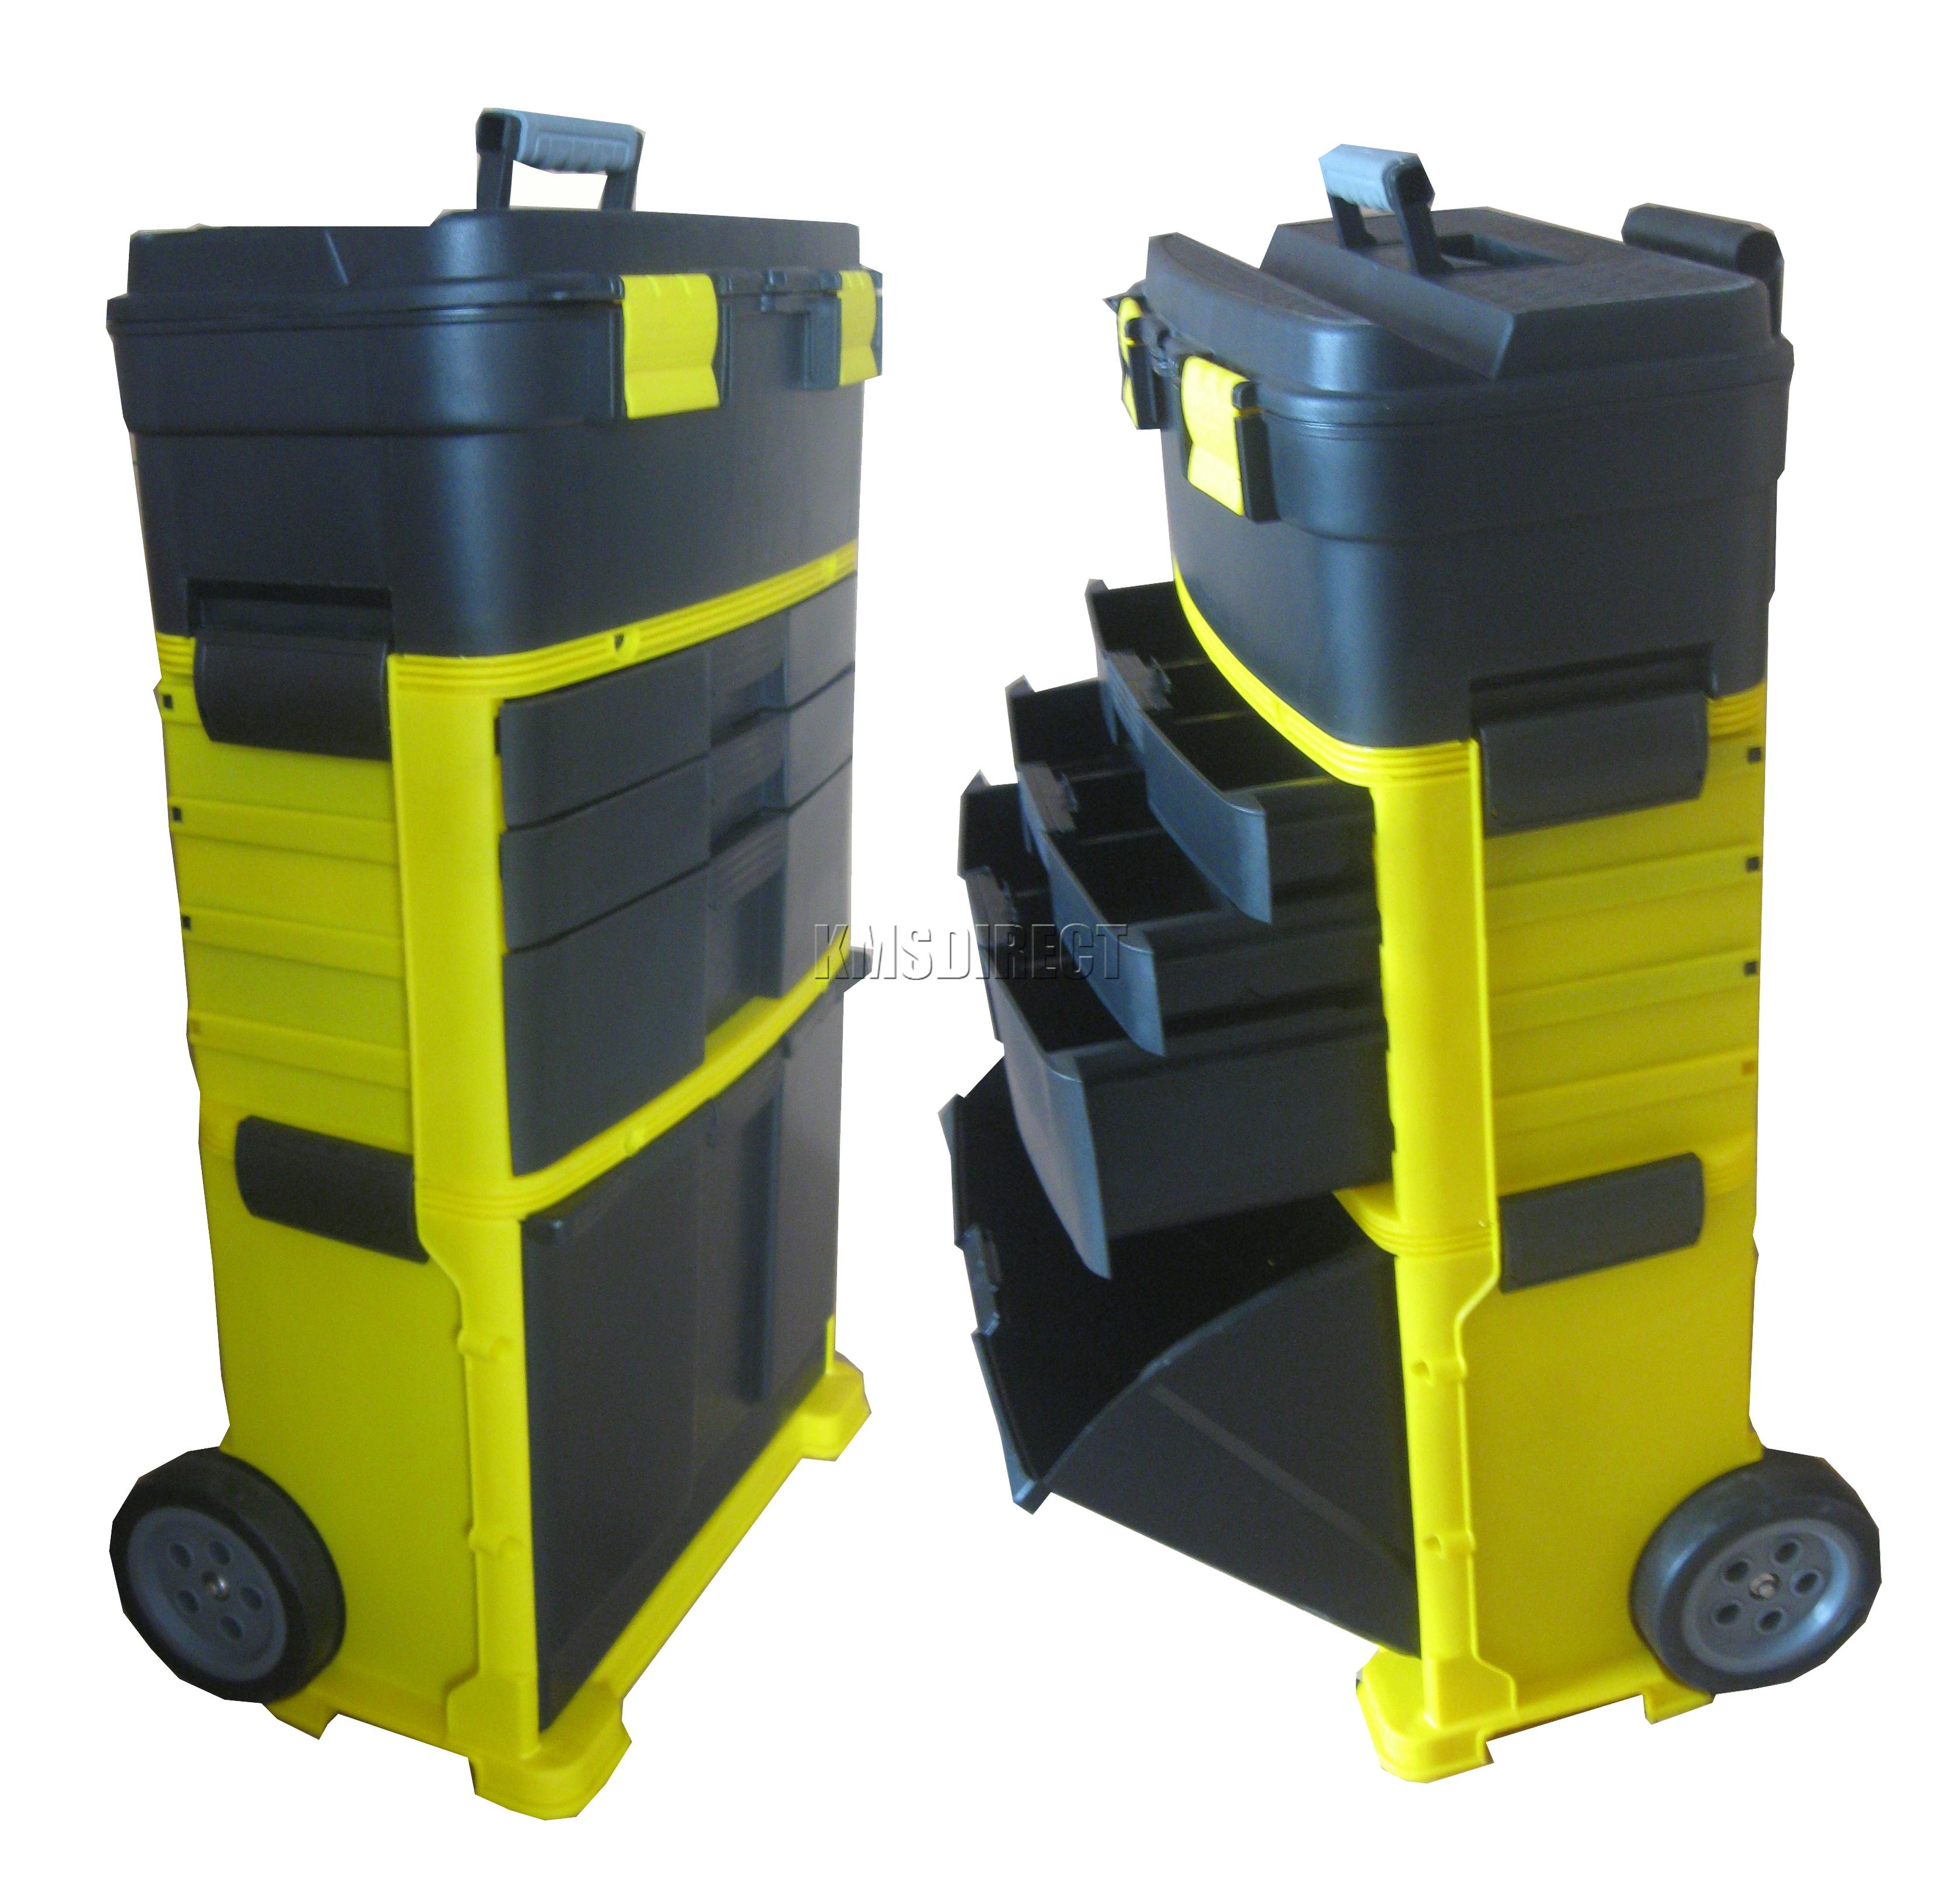 Westwood Mobile Roller Workshop Chest Trolley Storage Tool